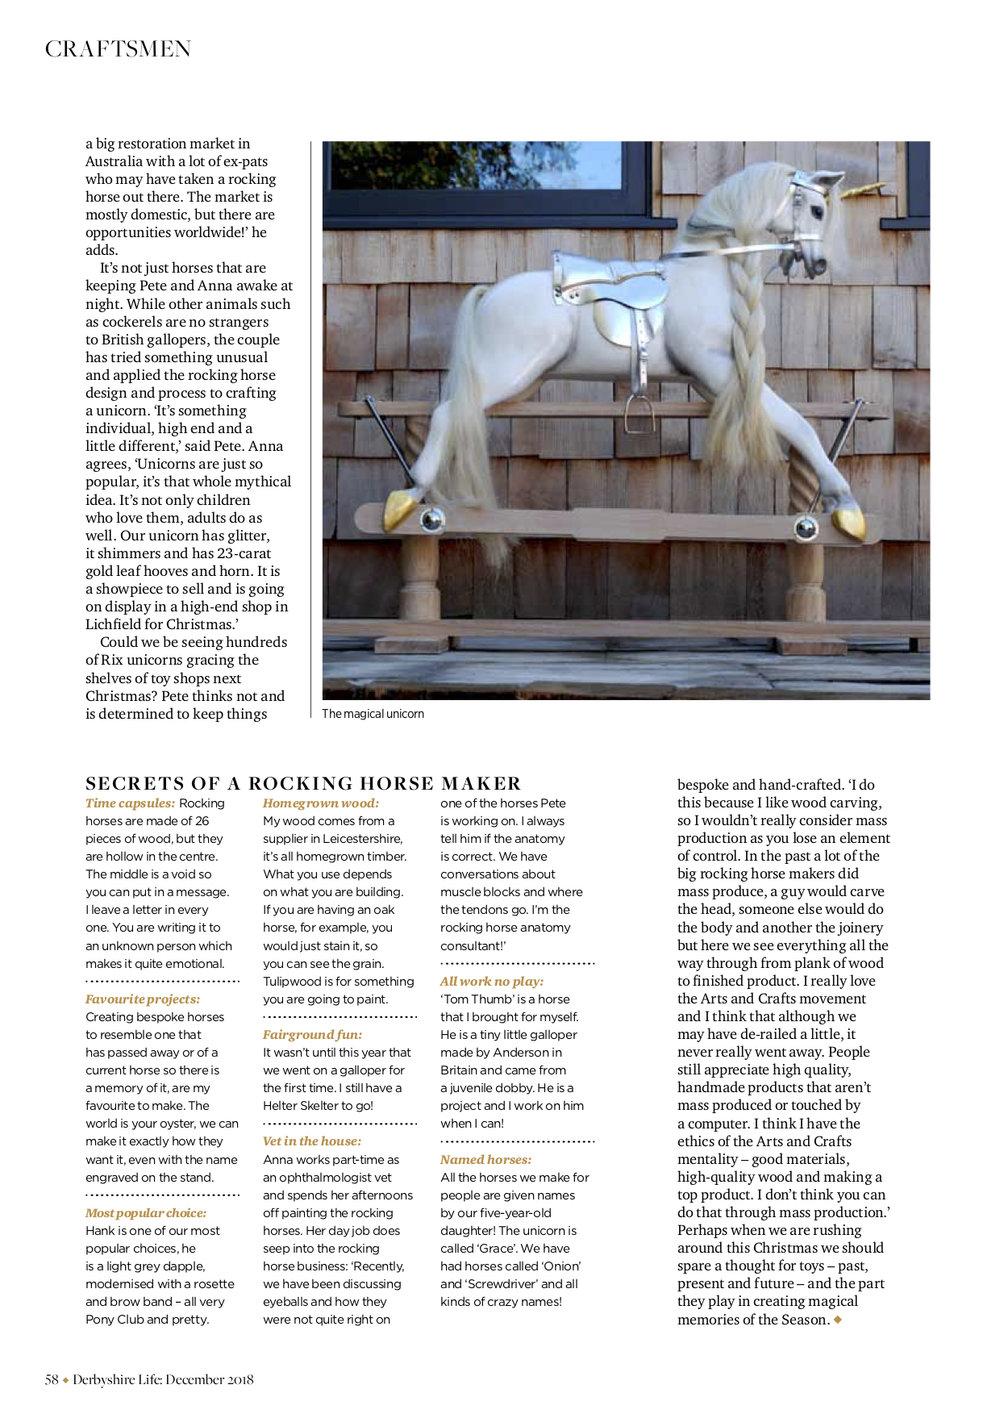 Publishedfinalrockinghorse5.jpg